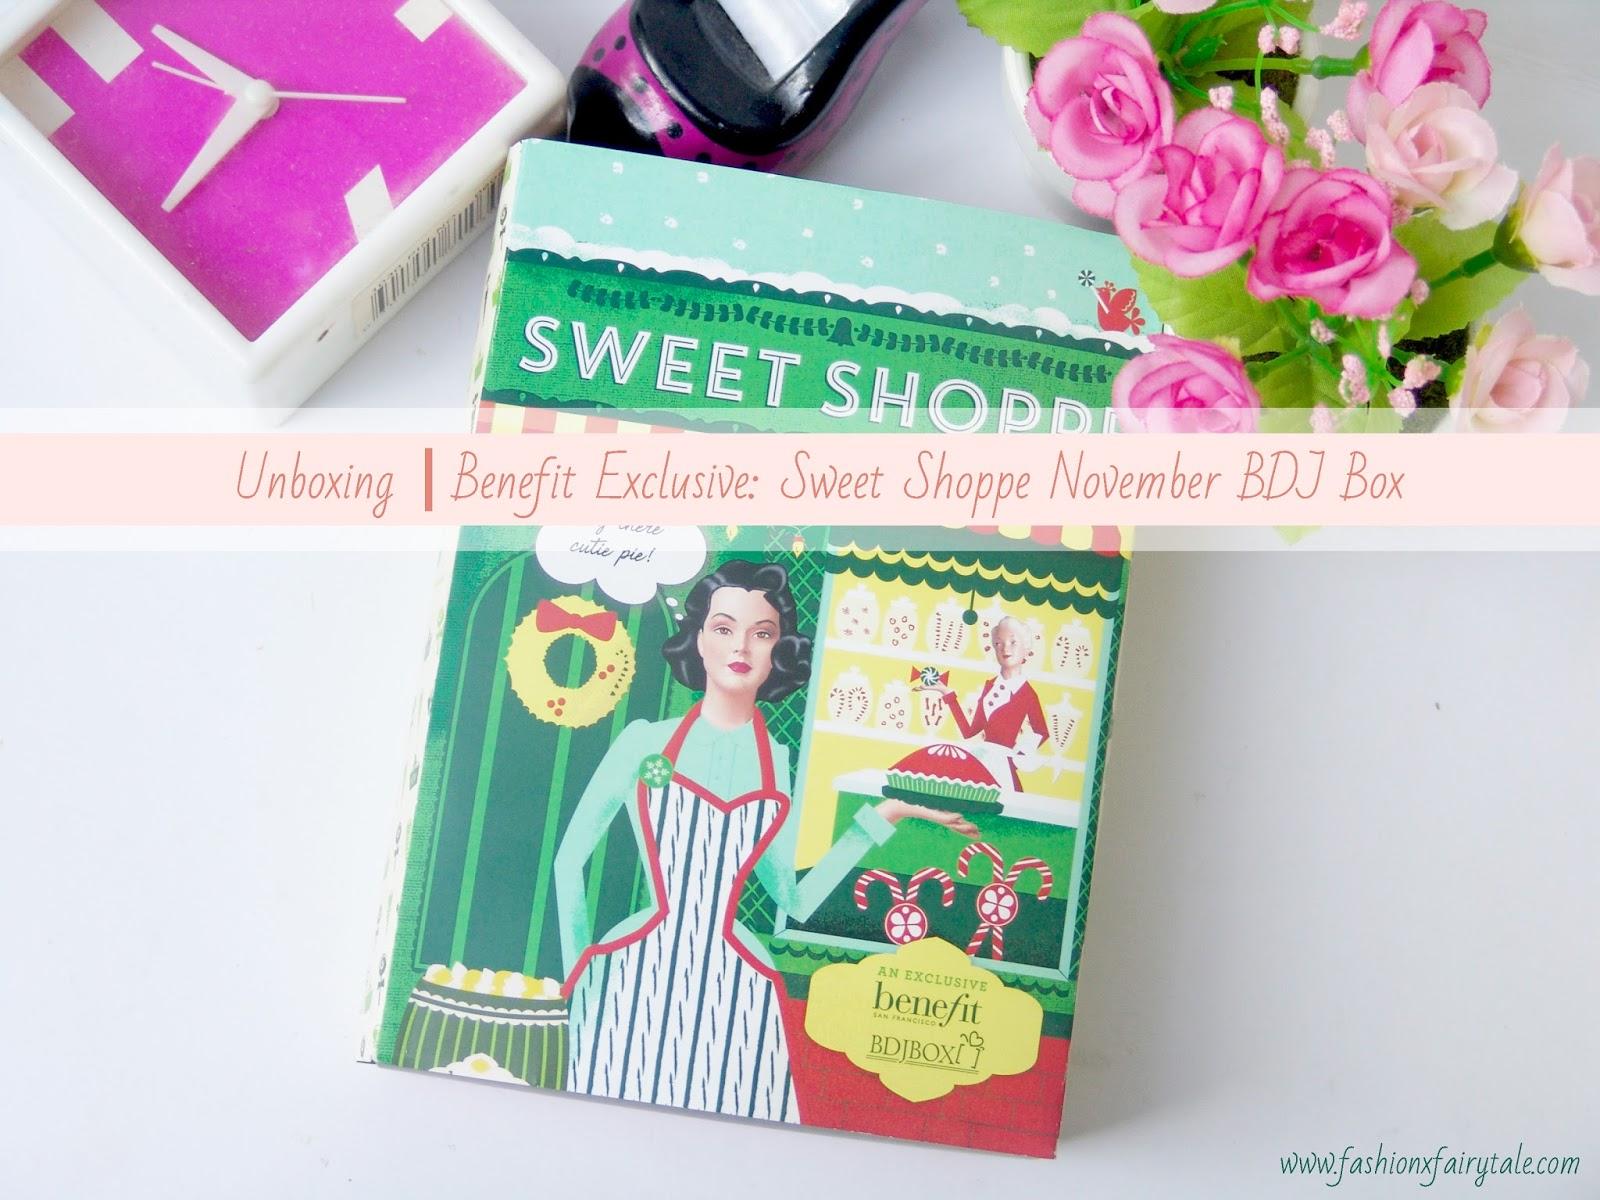 Unboxing | Benefit Exclusive: Sweet Shoppe November BDJ Box